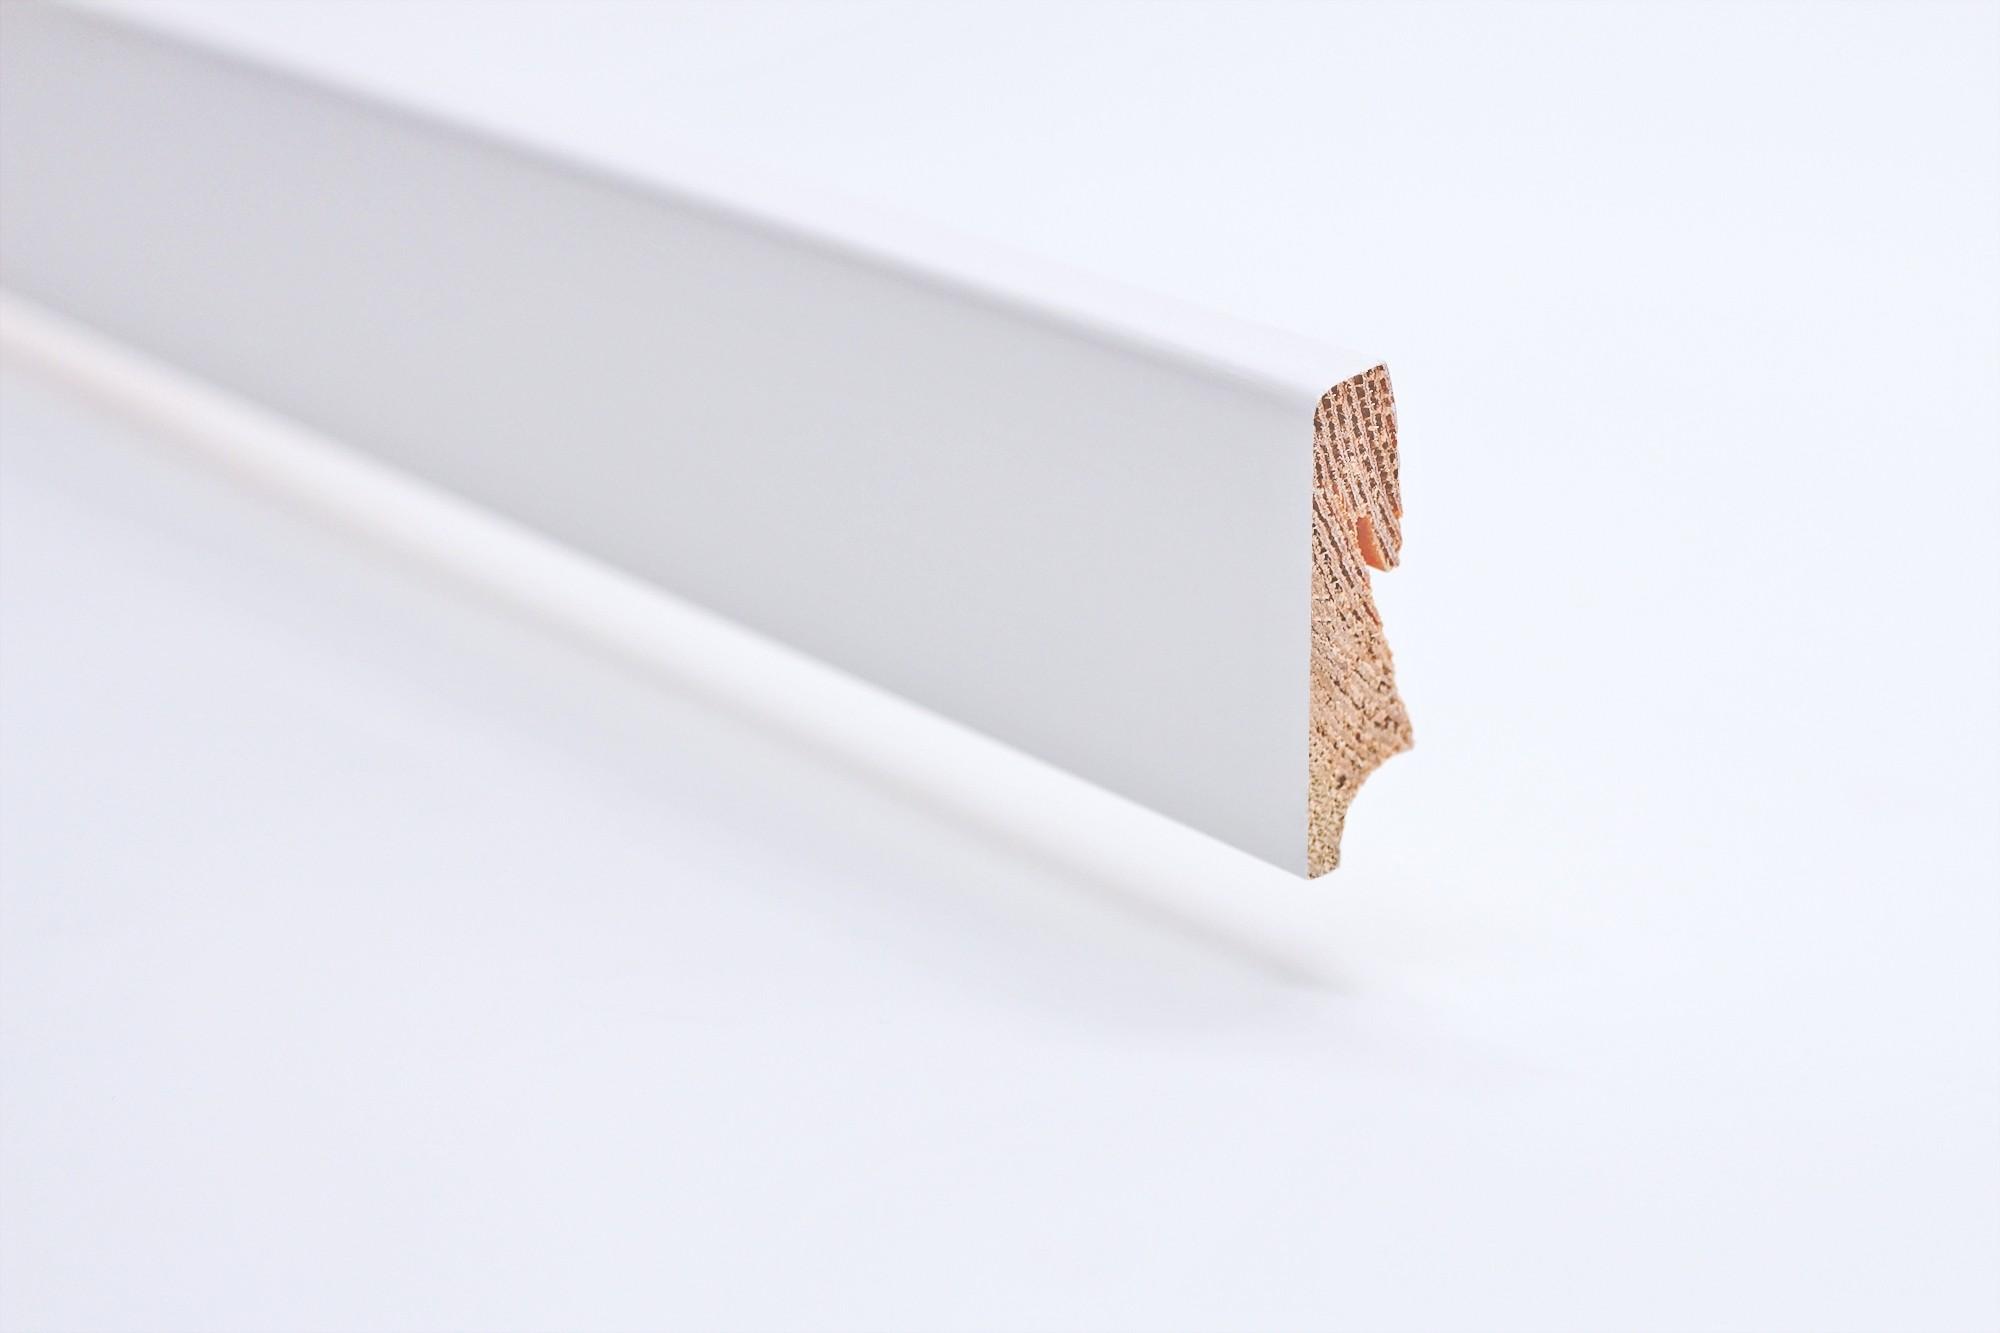 Sockelleiste (2400 x 16 x 51) konisch weiß lackiert Massivholz Profil - Interio